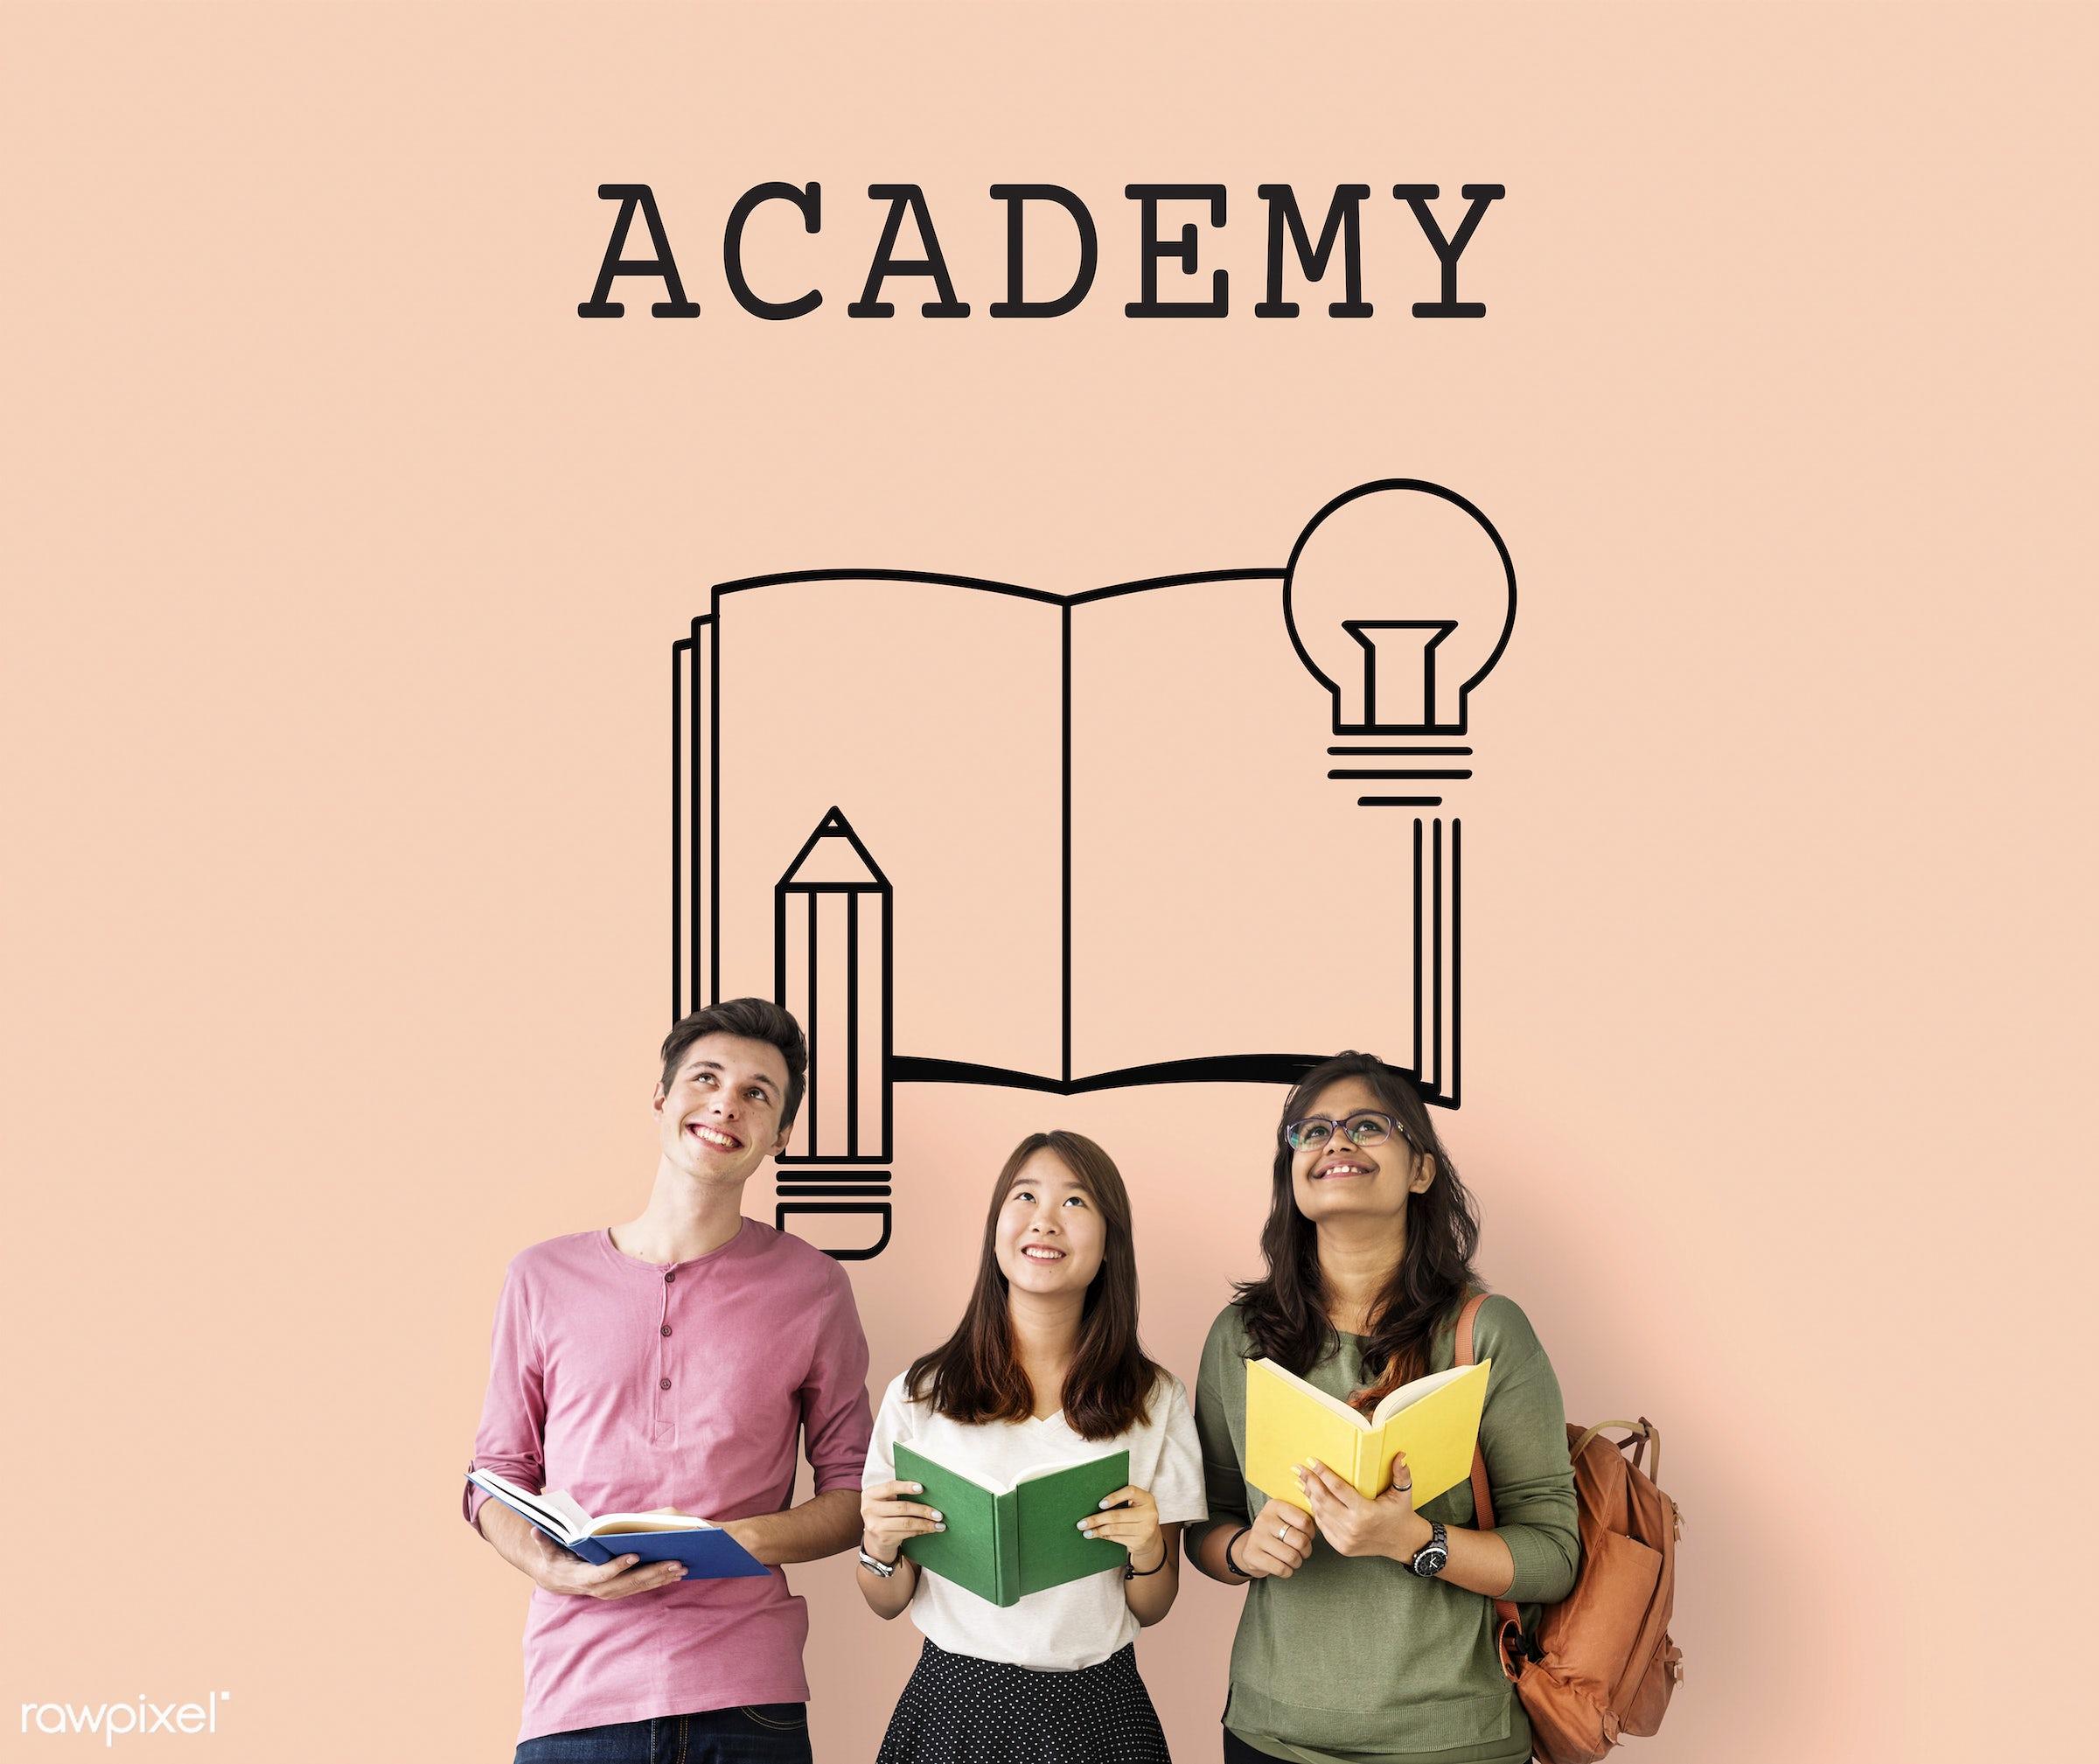 academy, african descent, asian, book, caucasian, certification, classes, comprehension, curriculum, diversity, education,...